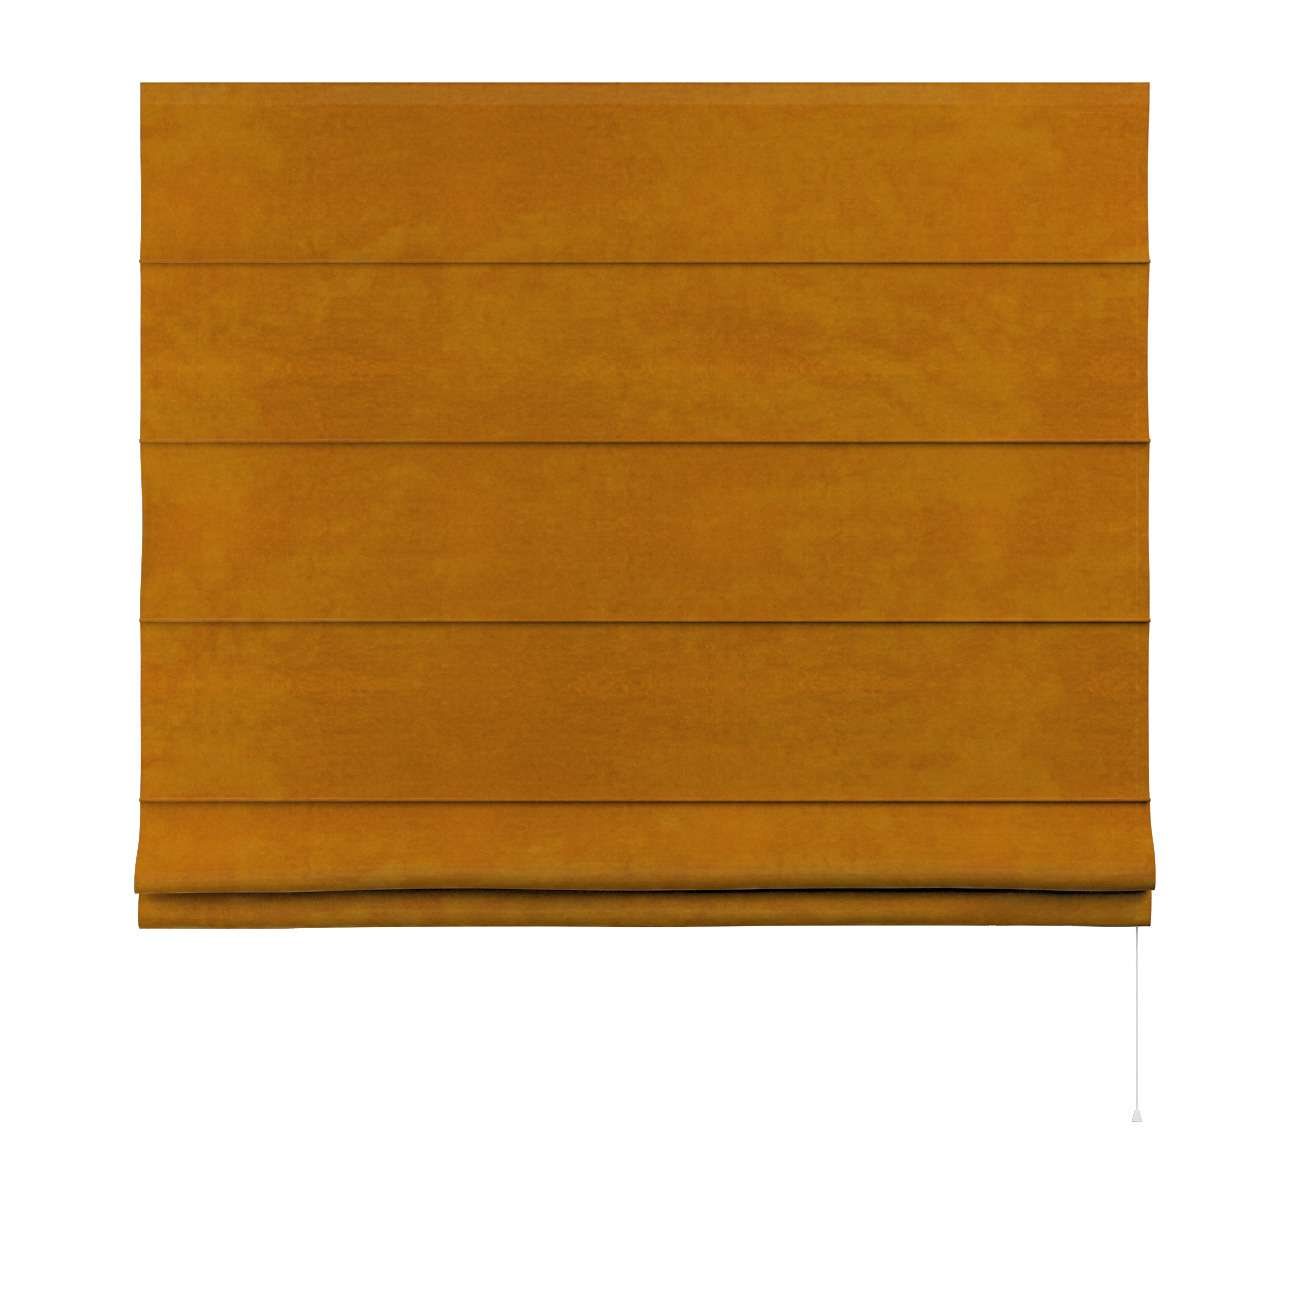 Rímska roleta Capri V kolekcii Velvet, tkanina: 704-23